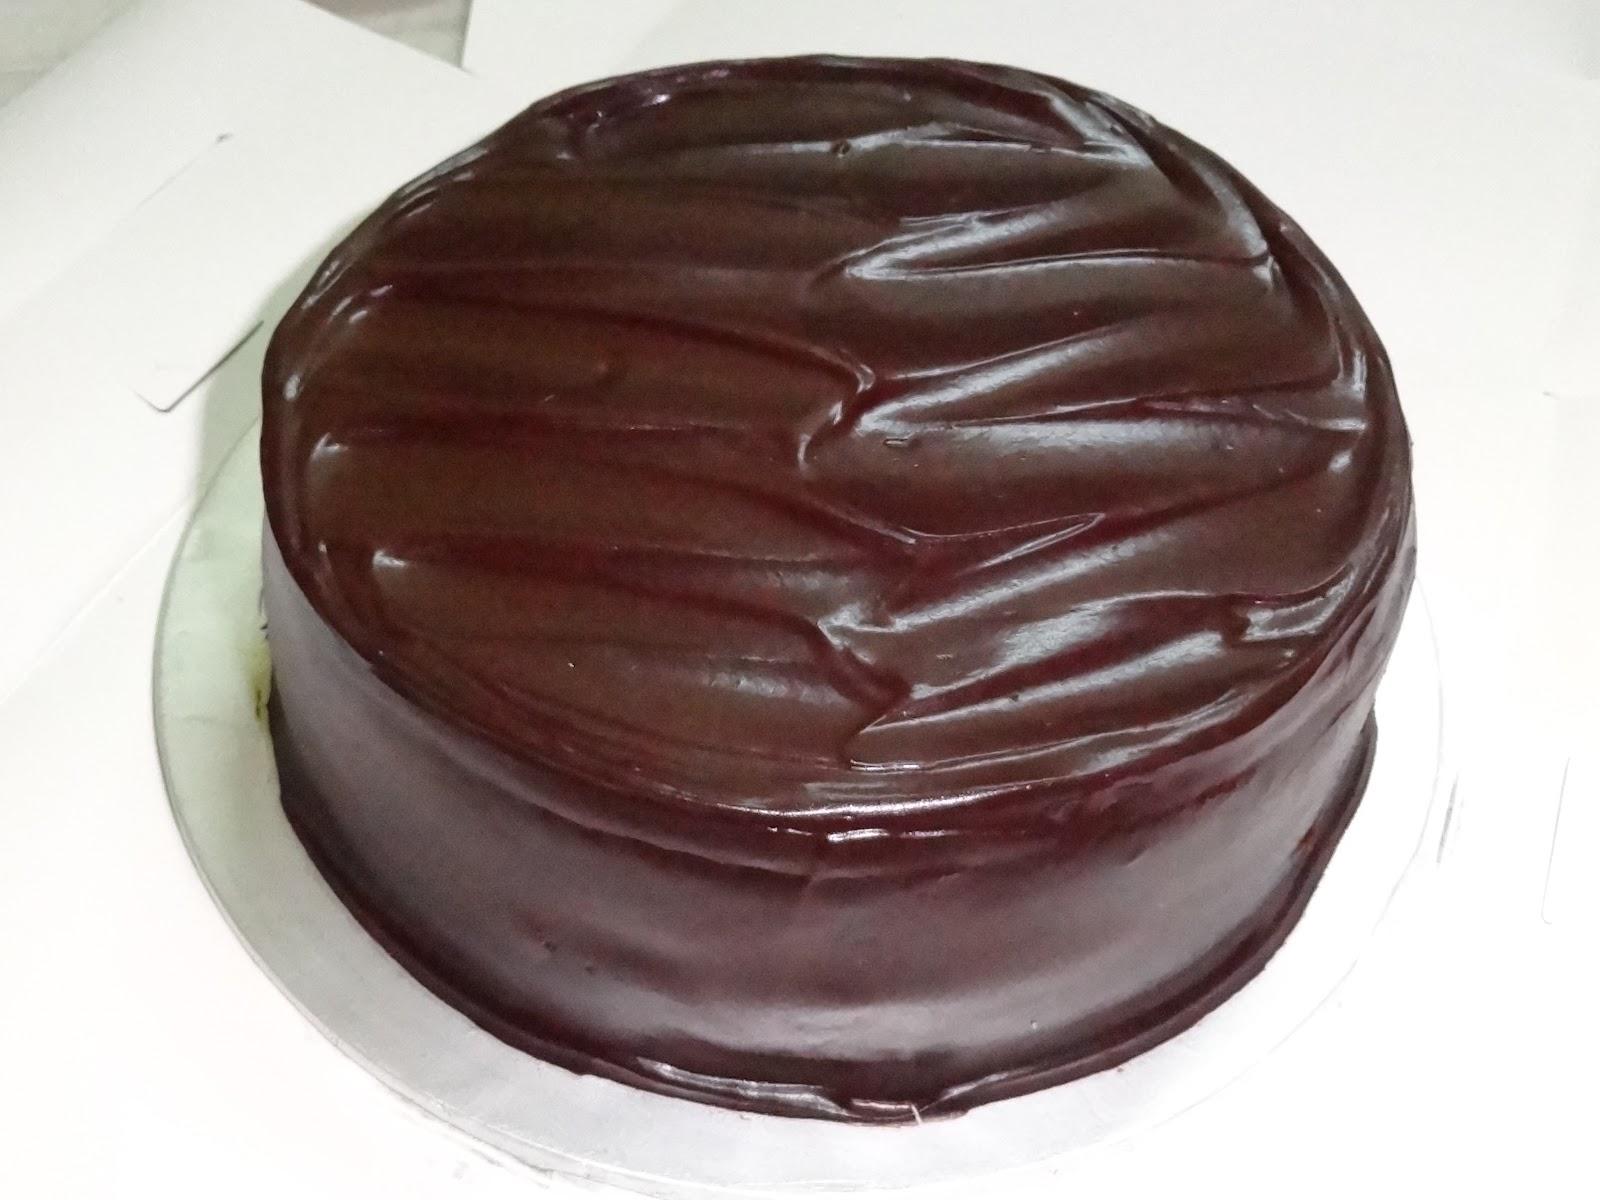 Awfully Chocolate Cake Singapore